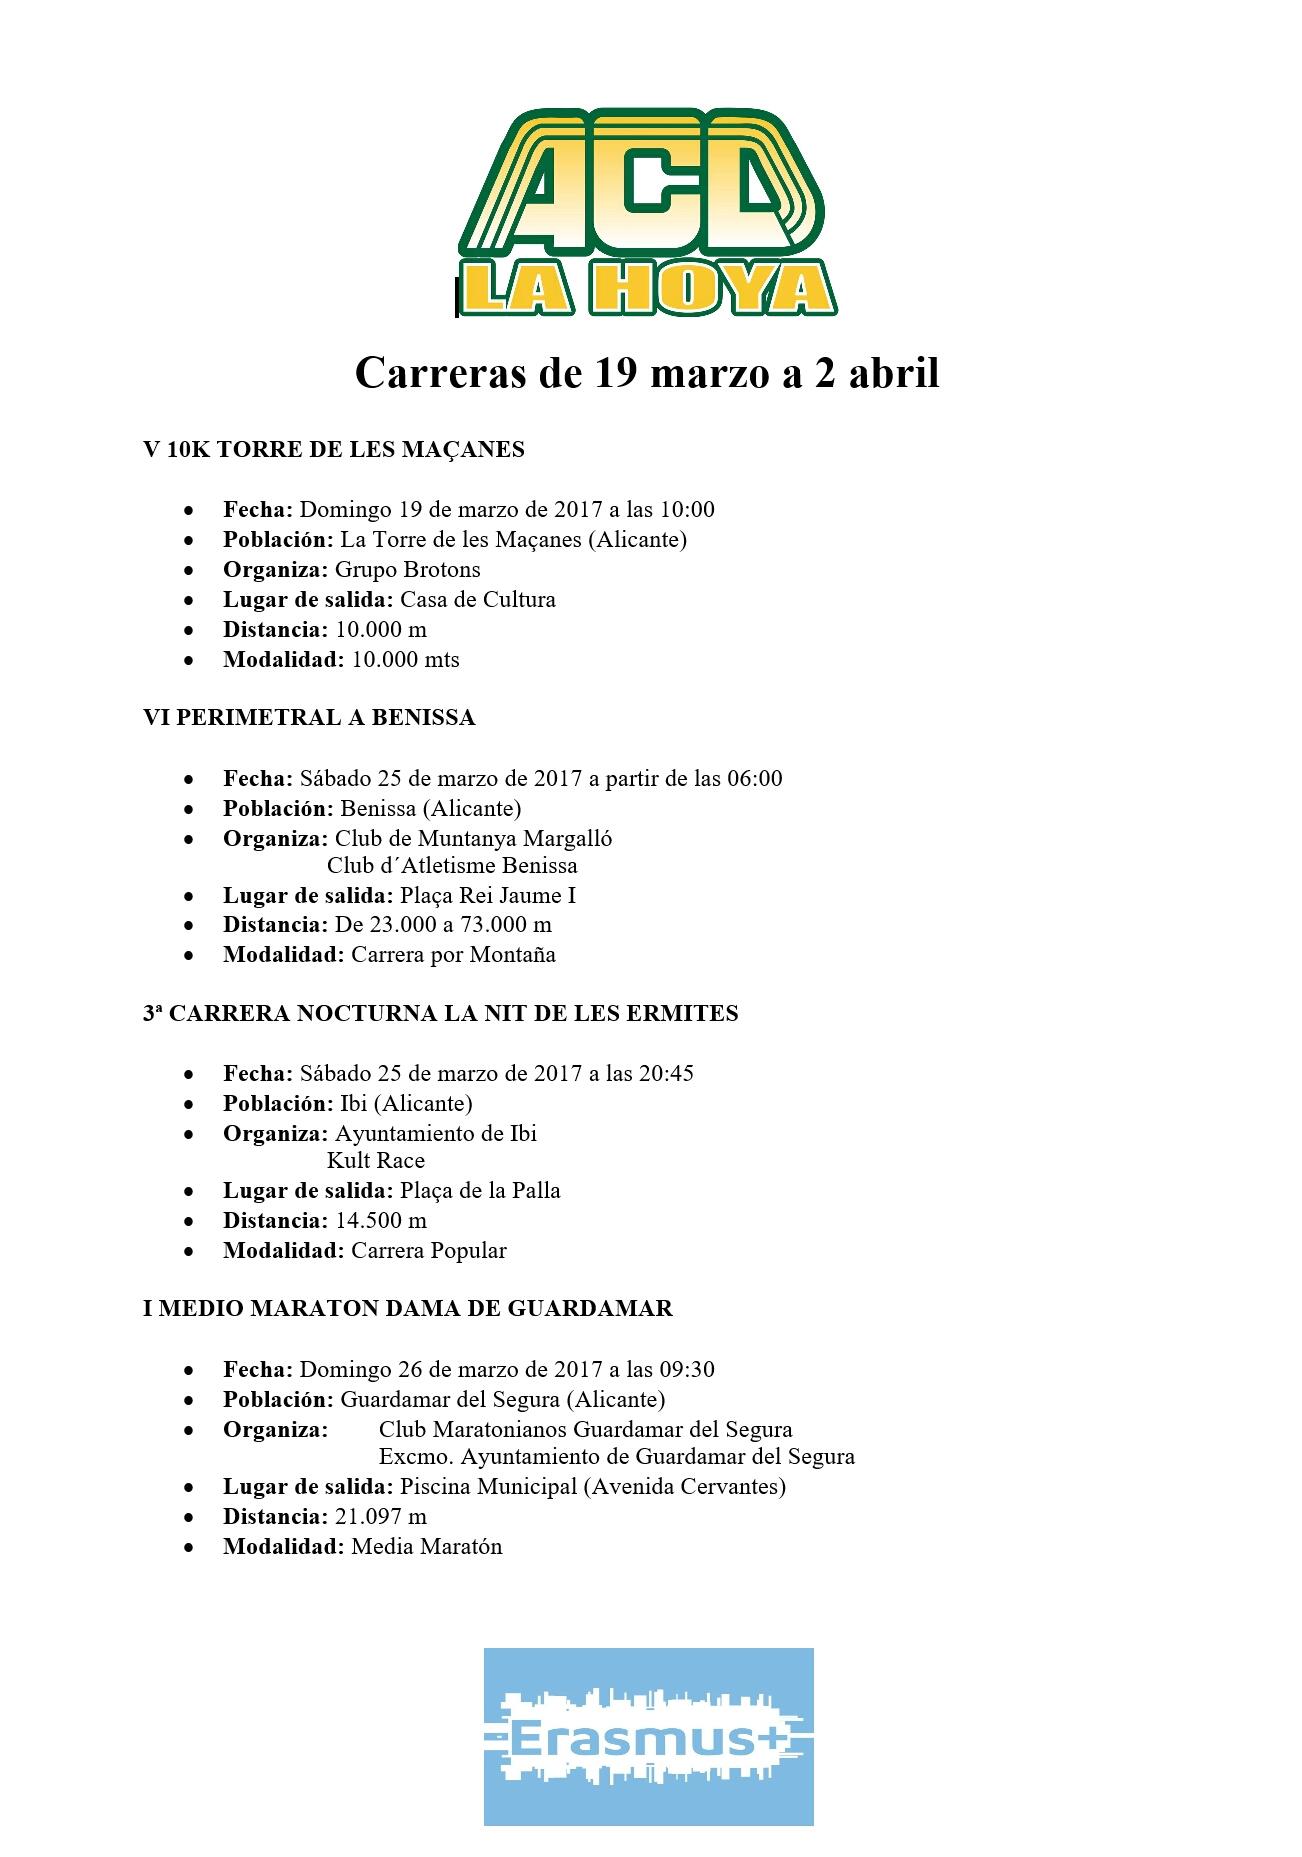 Carreras de 19 – 2 abril (1)